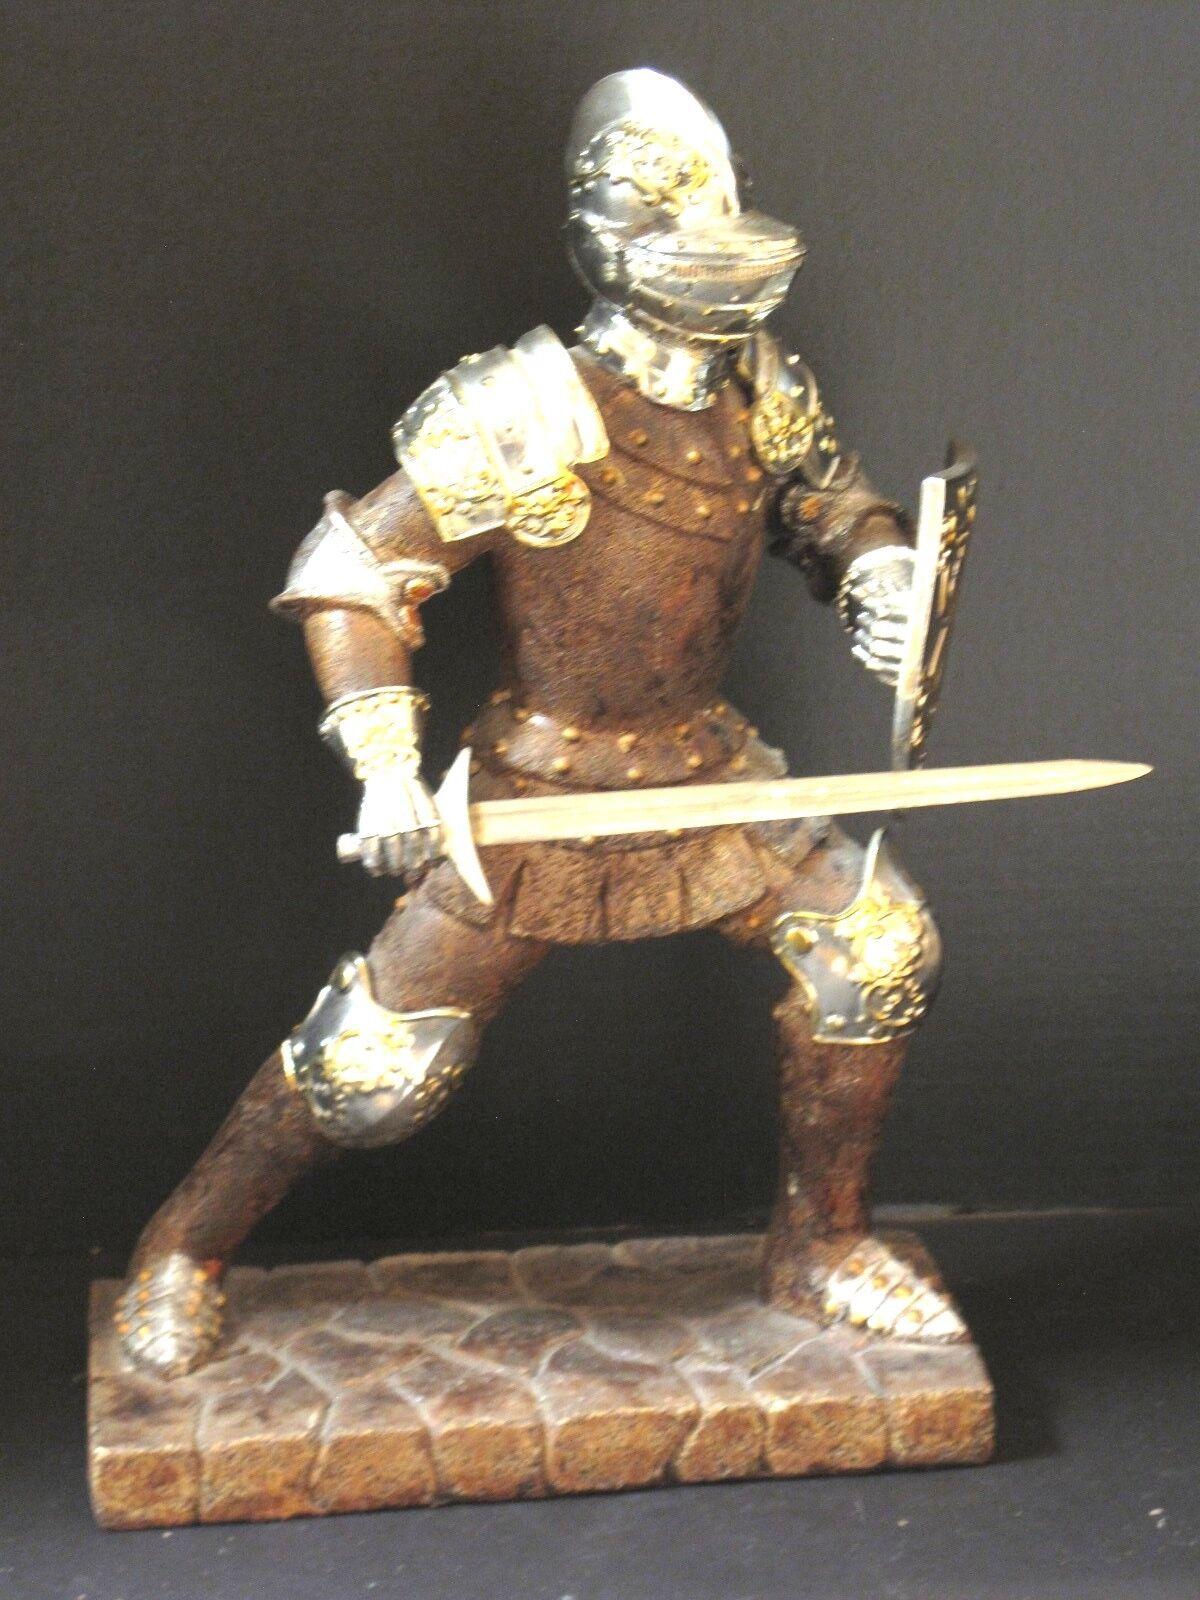 Large Vintage Valiant Crusader Knight Armor Sword Statue Medieval Dragon Shield